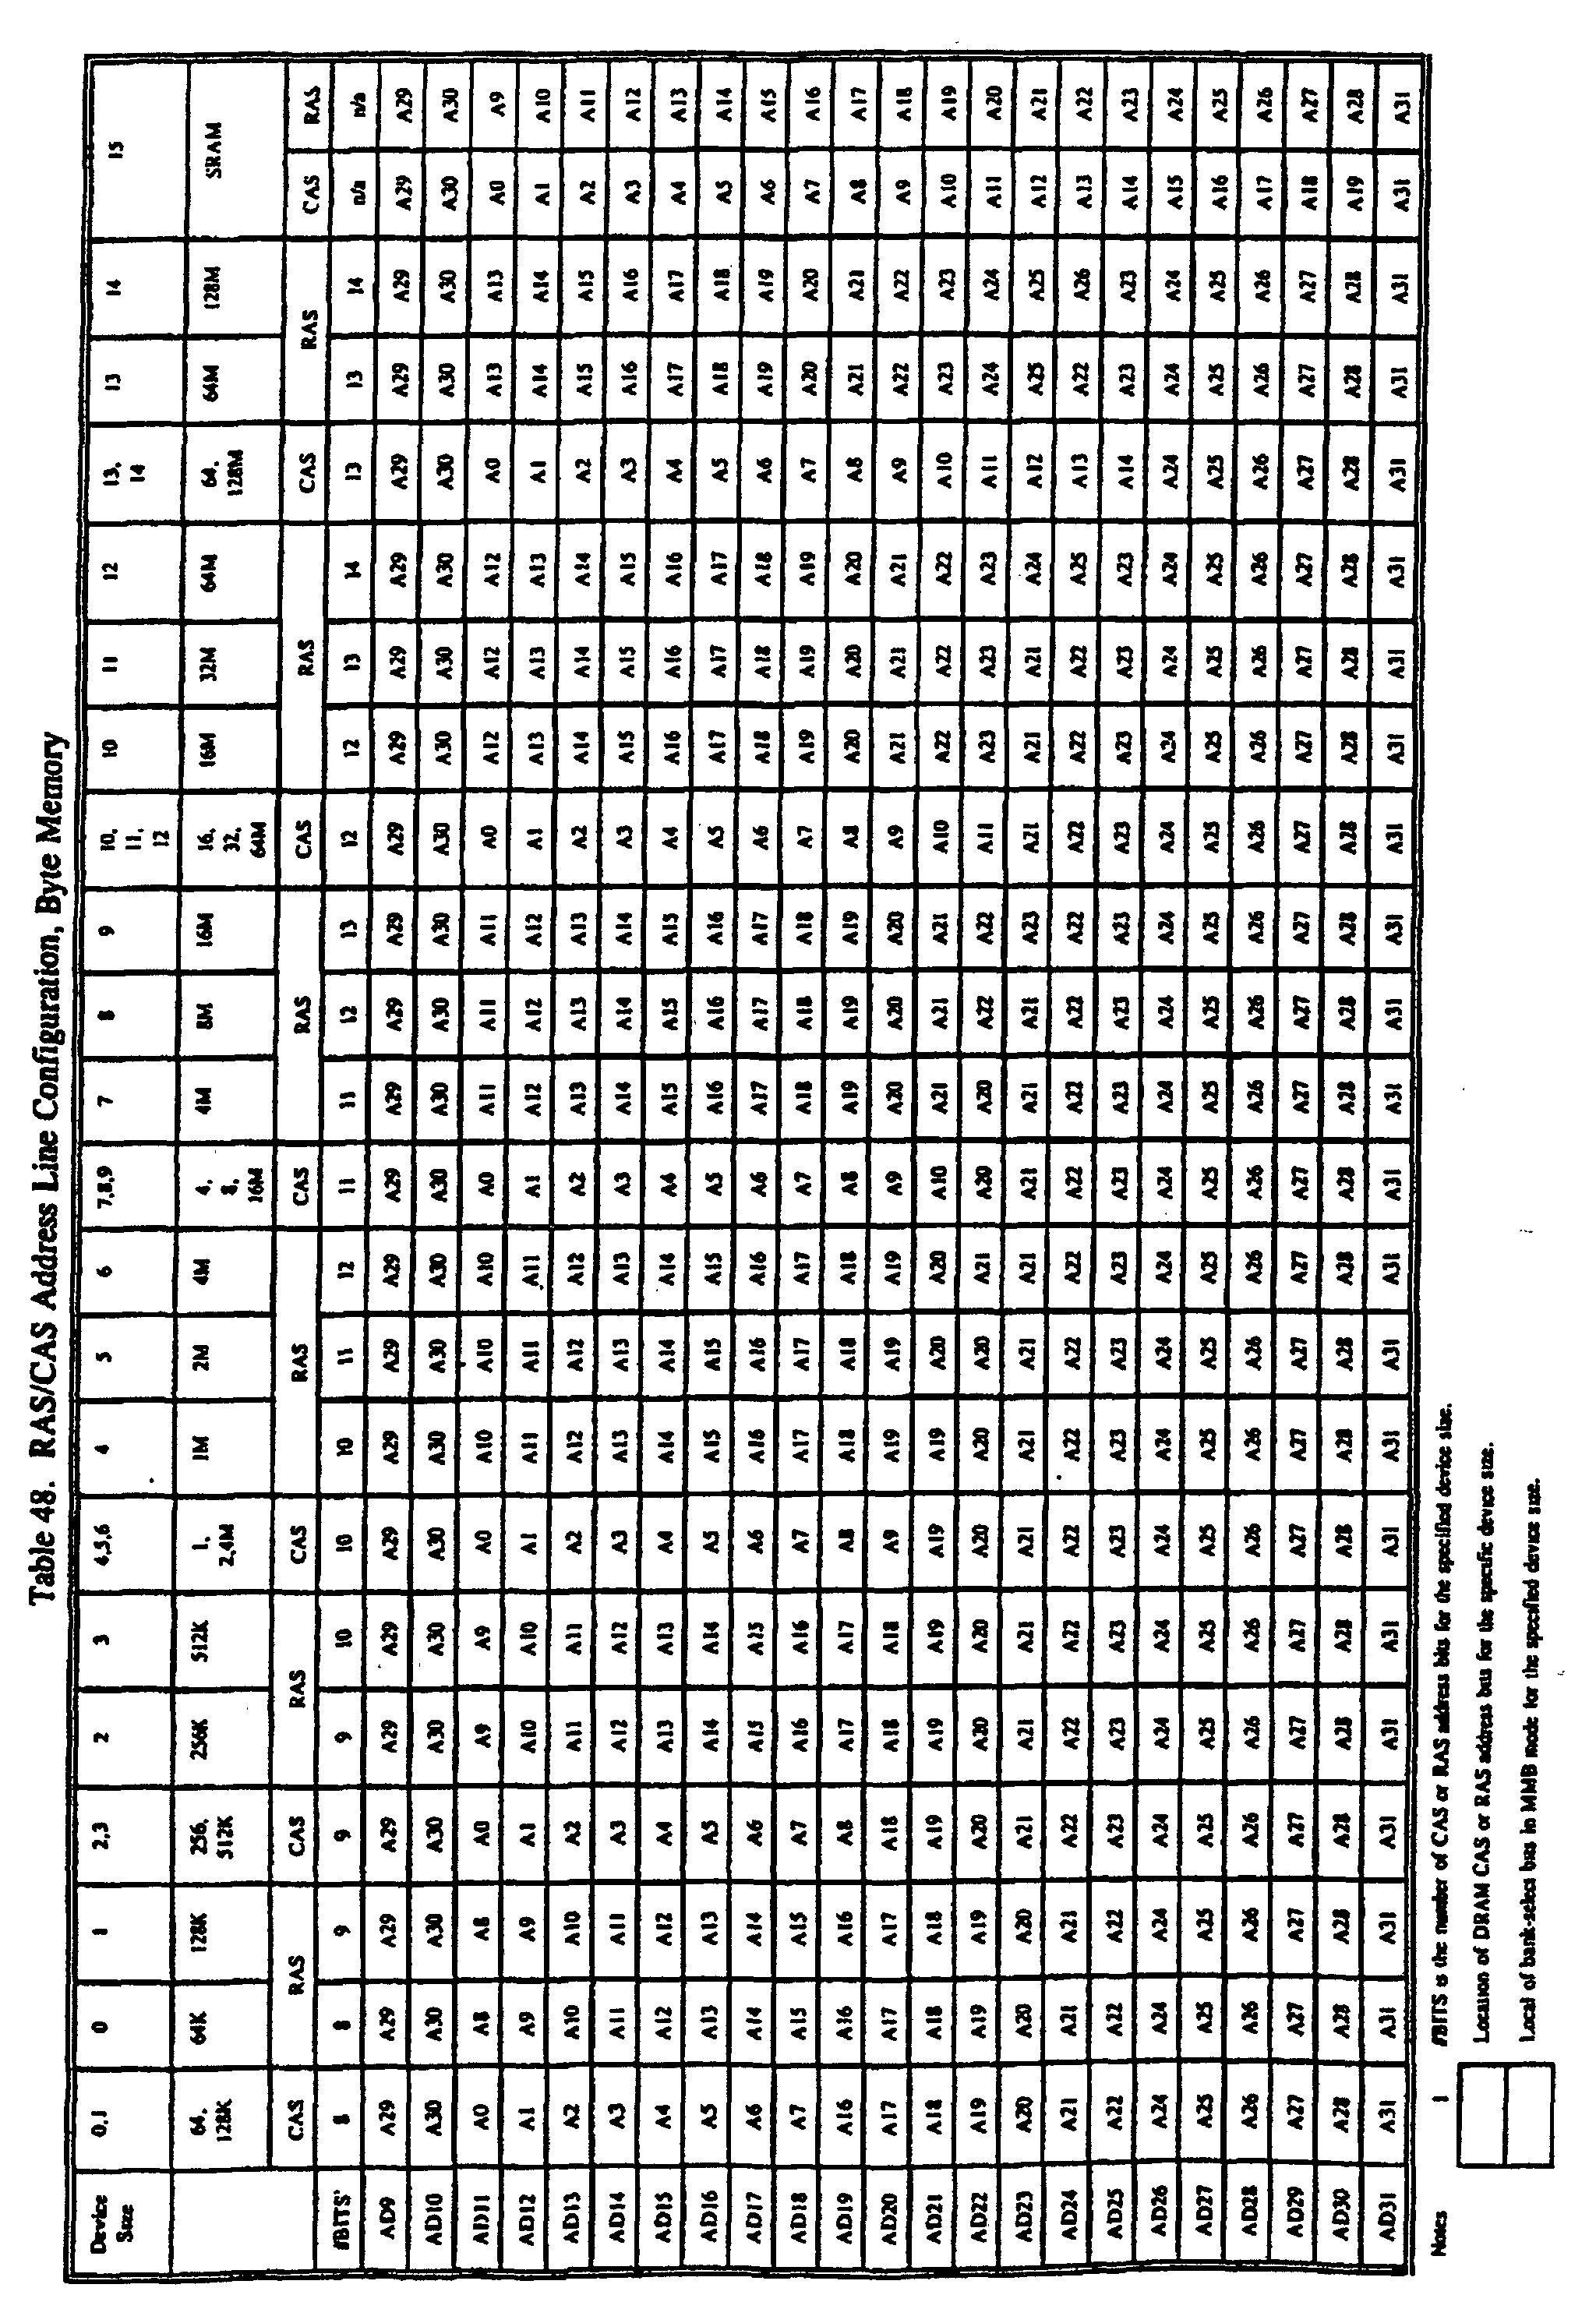 Ep0870226b1 Risc Microprocessor Architecture Google Patents Toshiba G7 Asd Wiring Diagram Figure 01110001